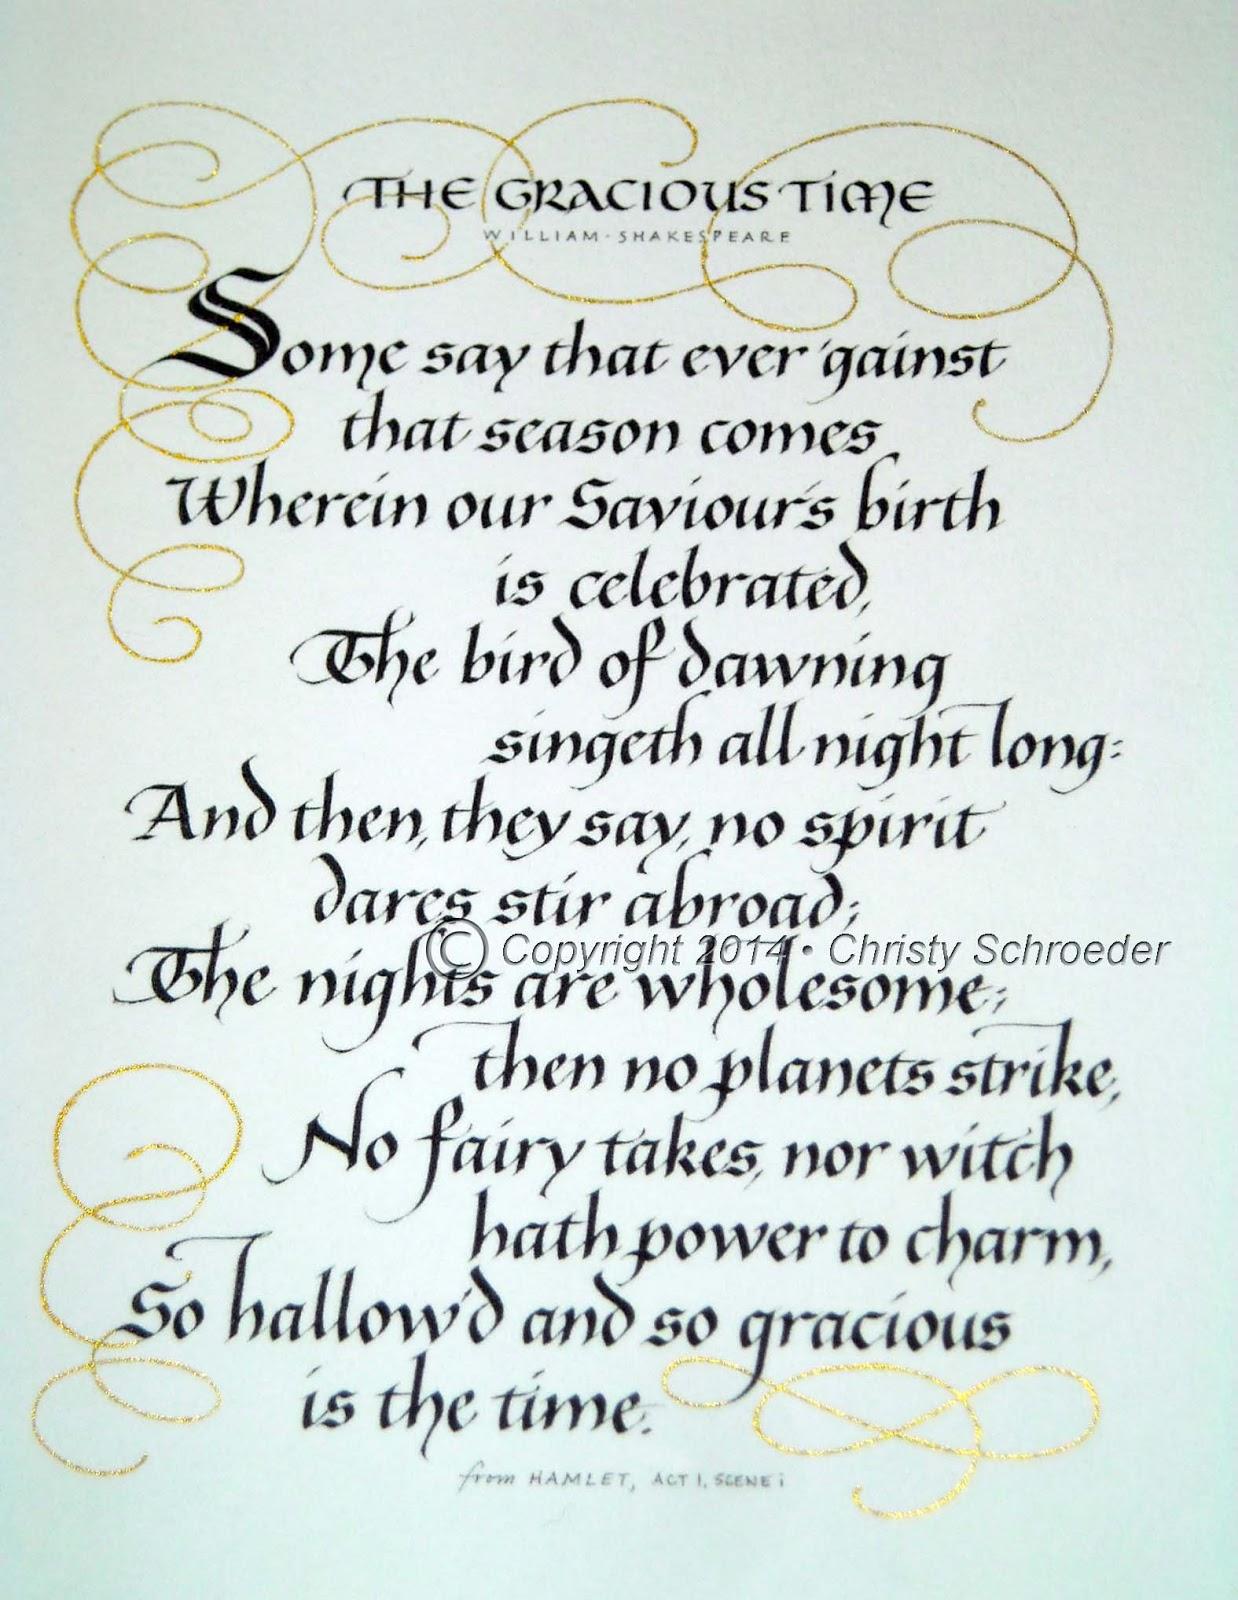 Inspirational Christmas Poems For Seniors | www.topsimages.com